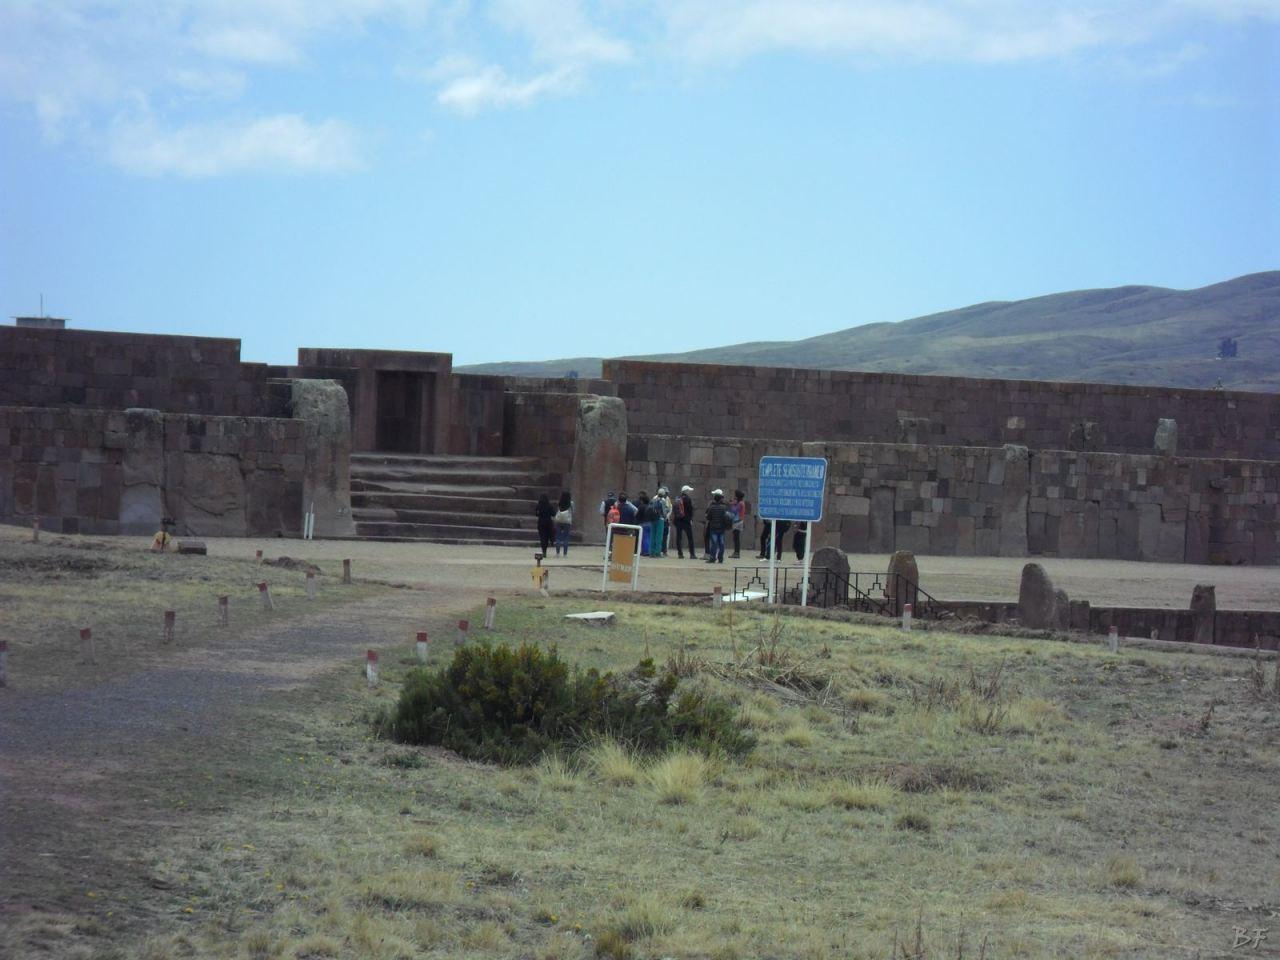 Sito-Megalitico-Piramide-Akapana-Kalasasaya-Menhir-Tiahuanaco-Bolivia-104